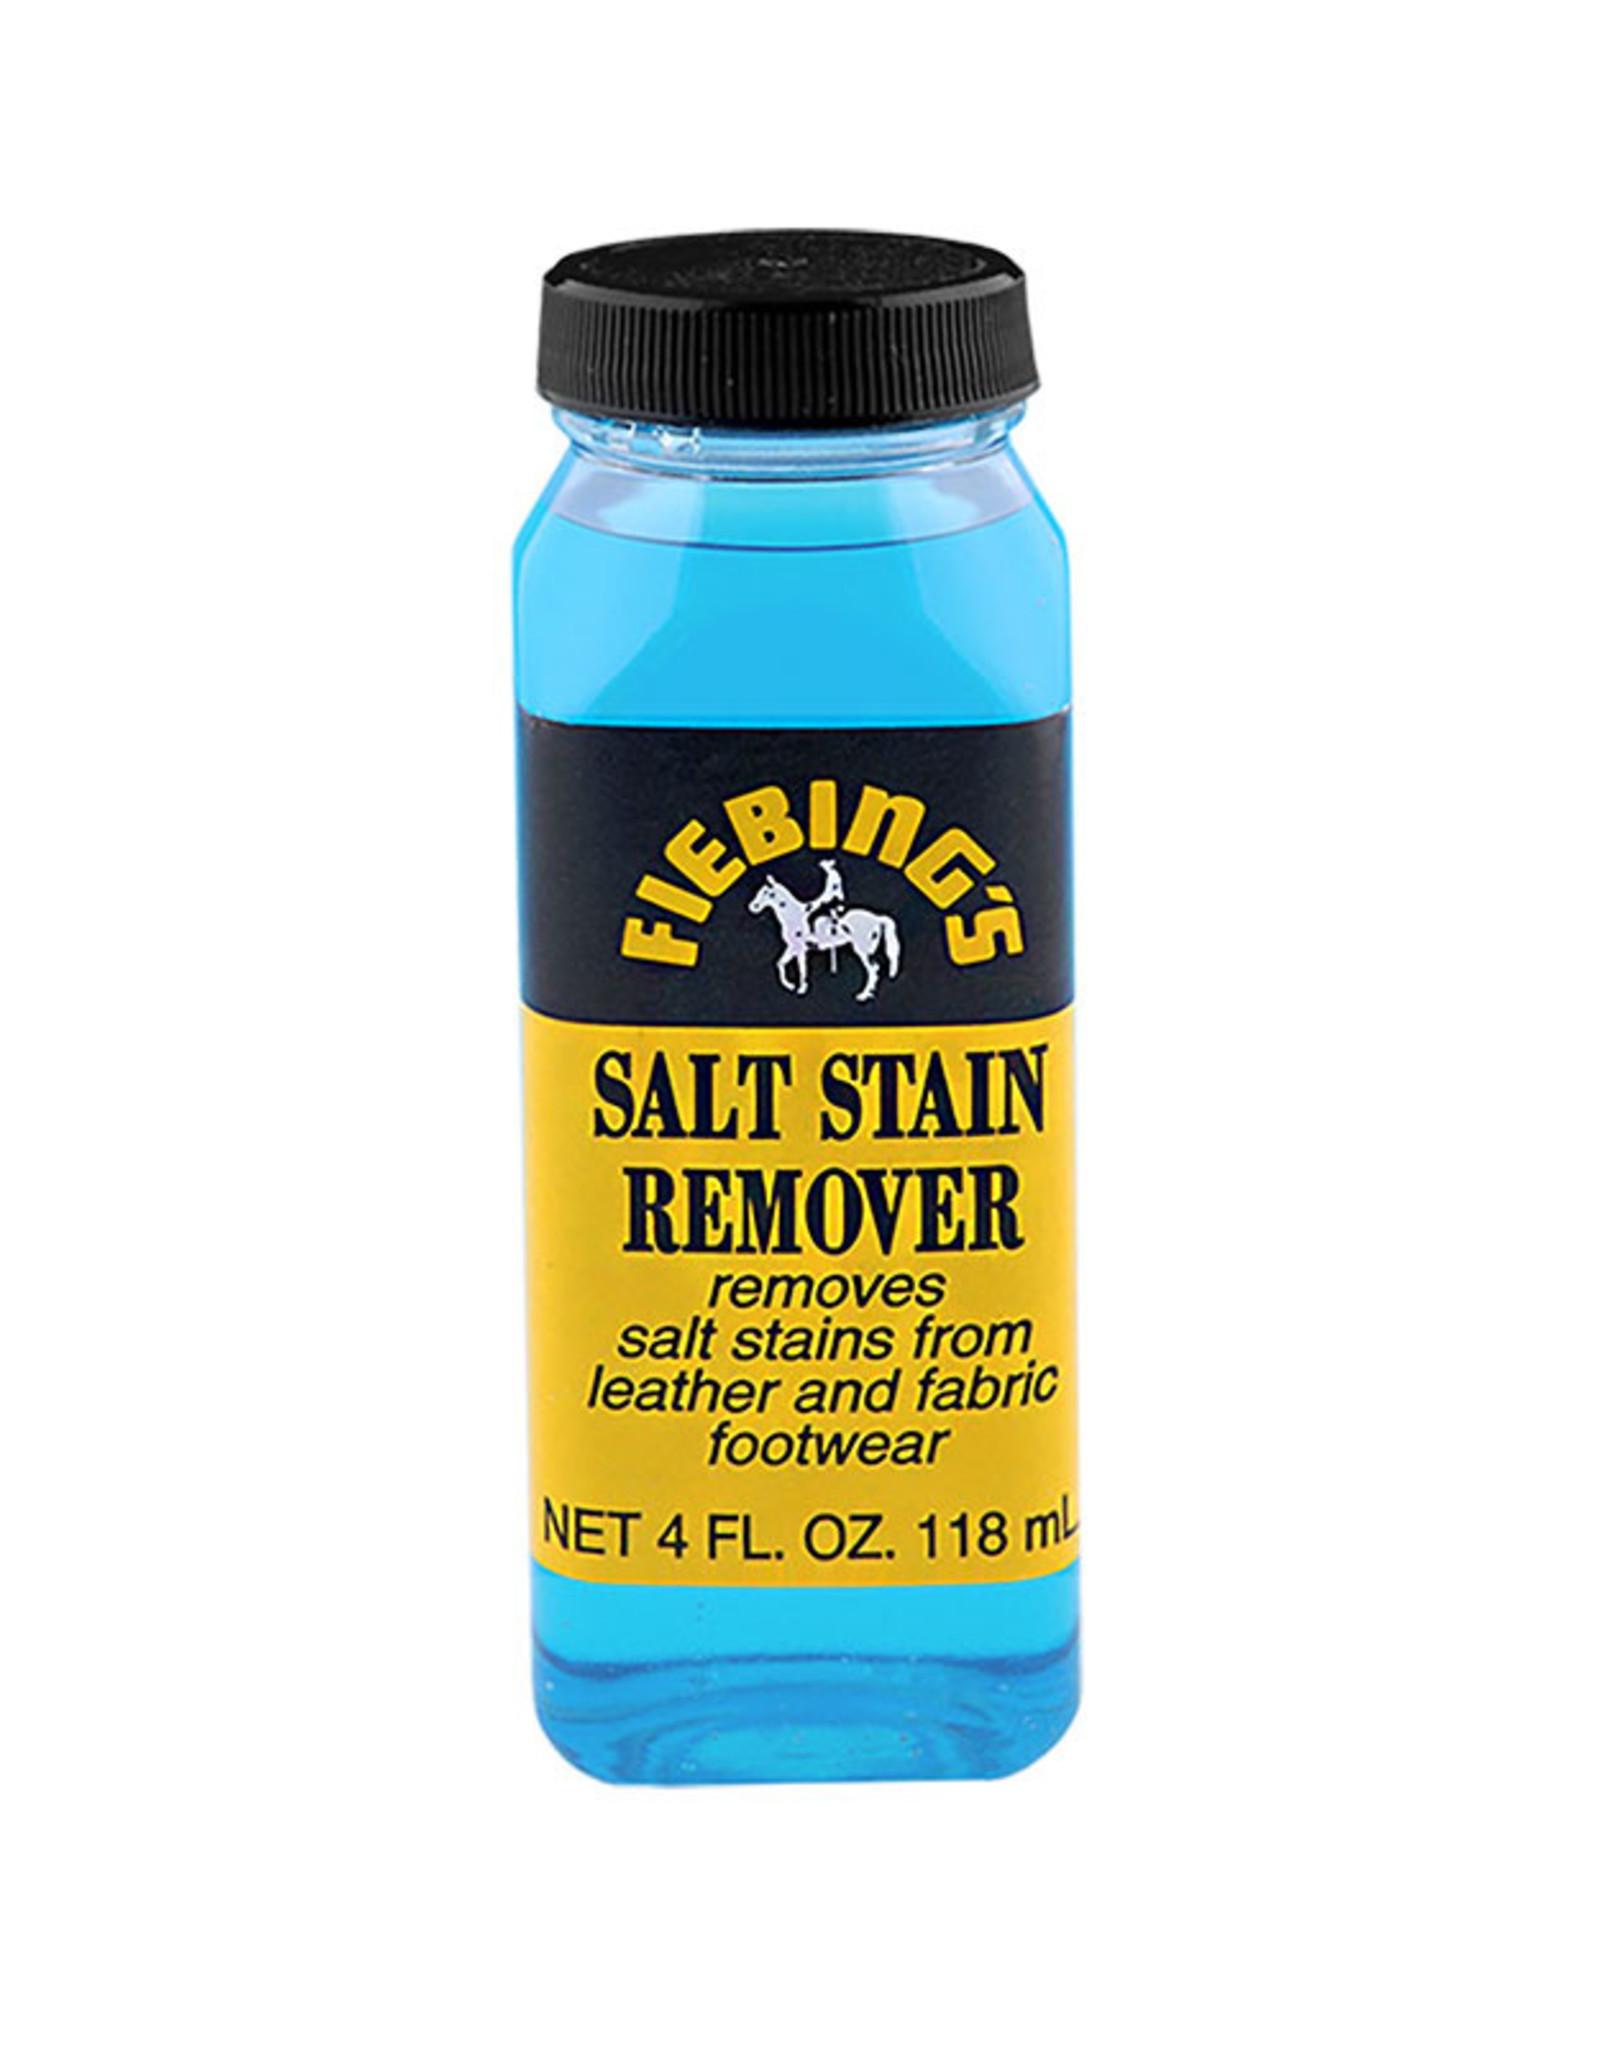 Fiebing's Salt & Stain Remover